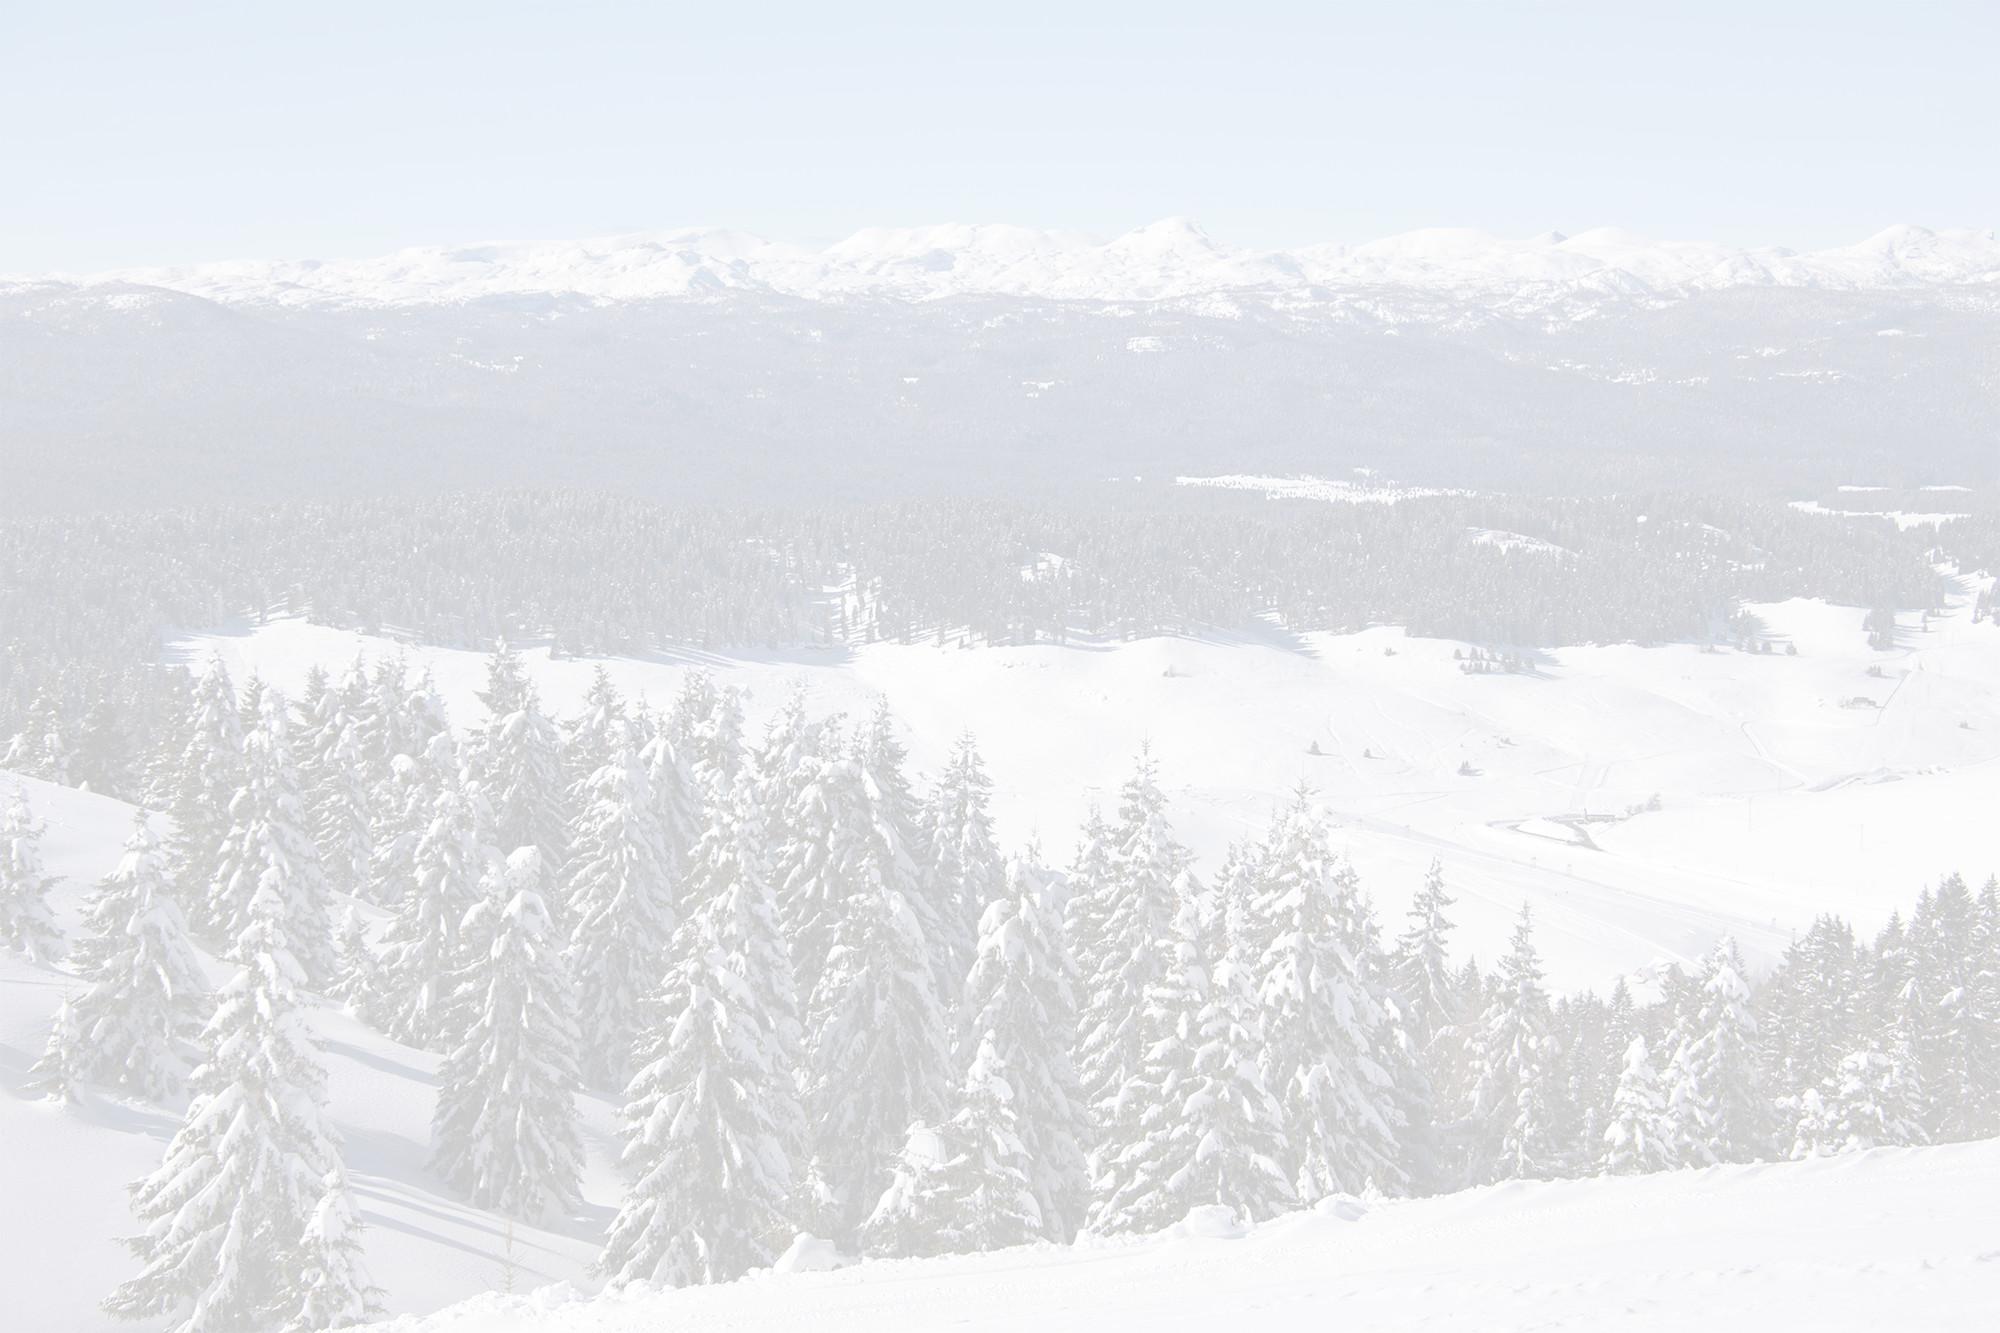 Sfondi neve 50 immagini for Sfondi natalizi 1920x1080